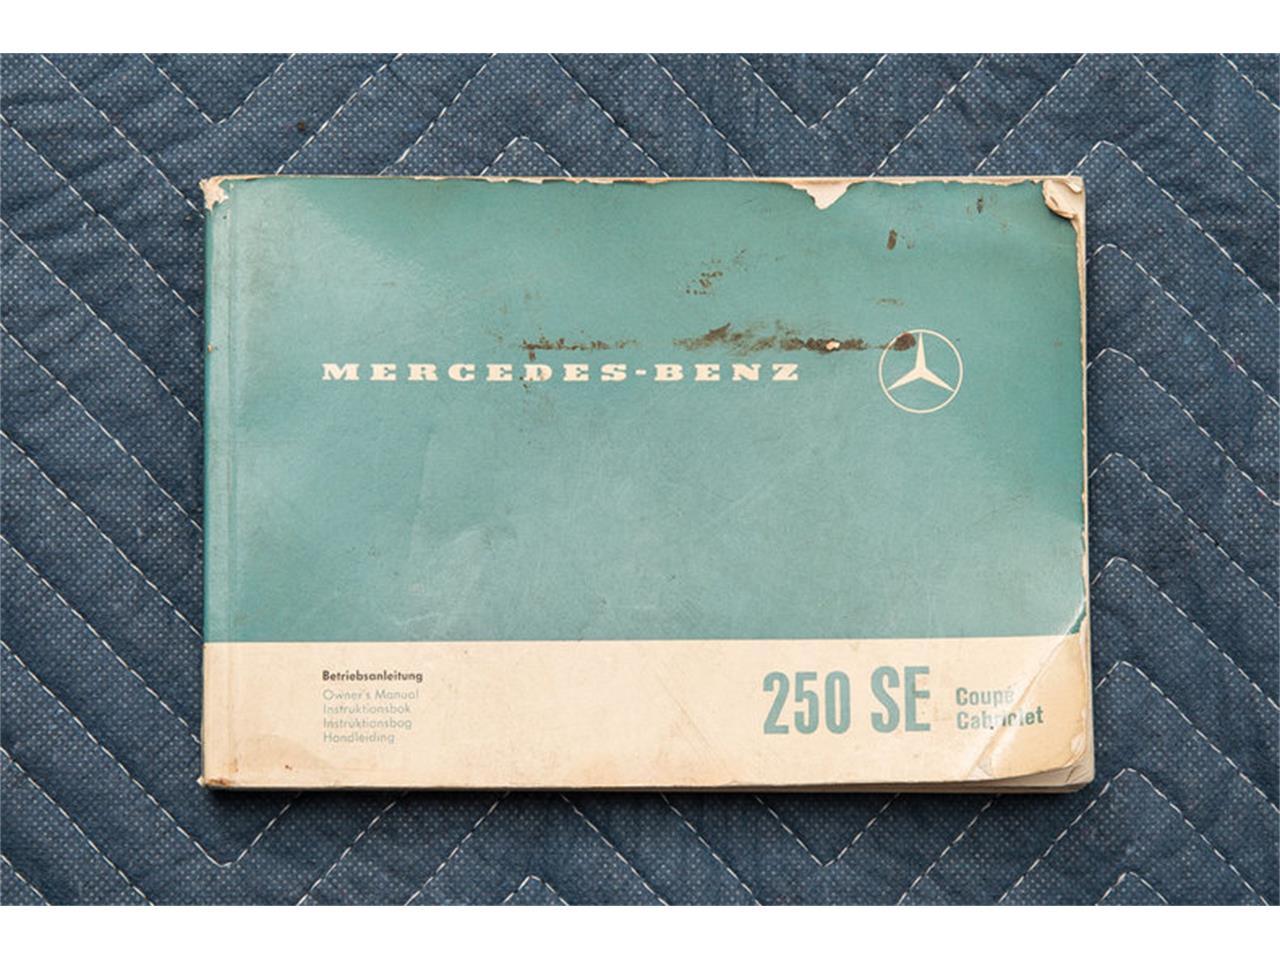 Large Picture of '66 Mercedes-Benz 250SE Auction Vehicle - DSVZ